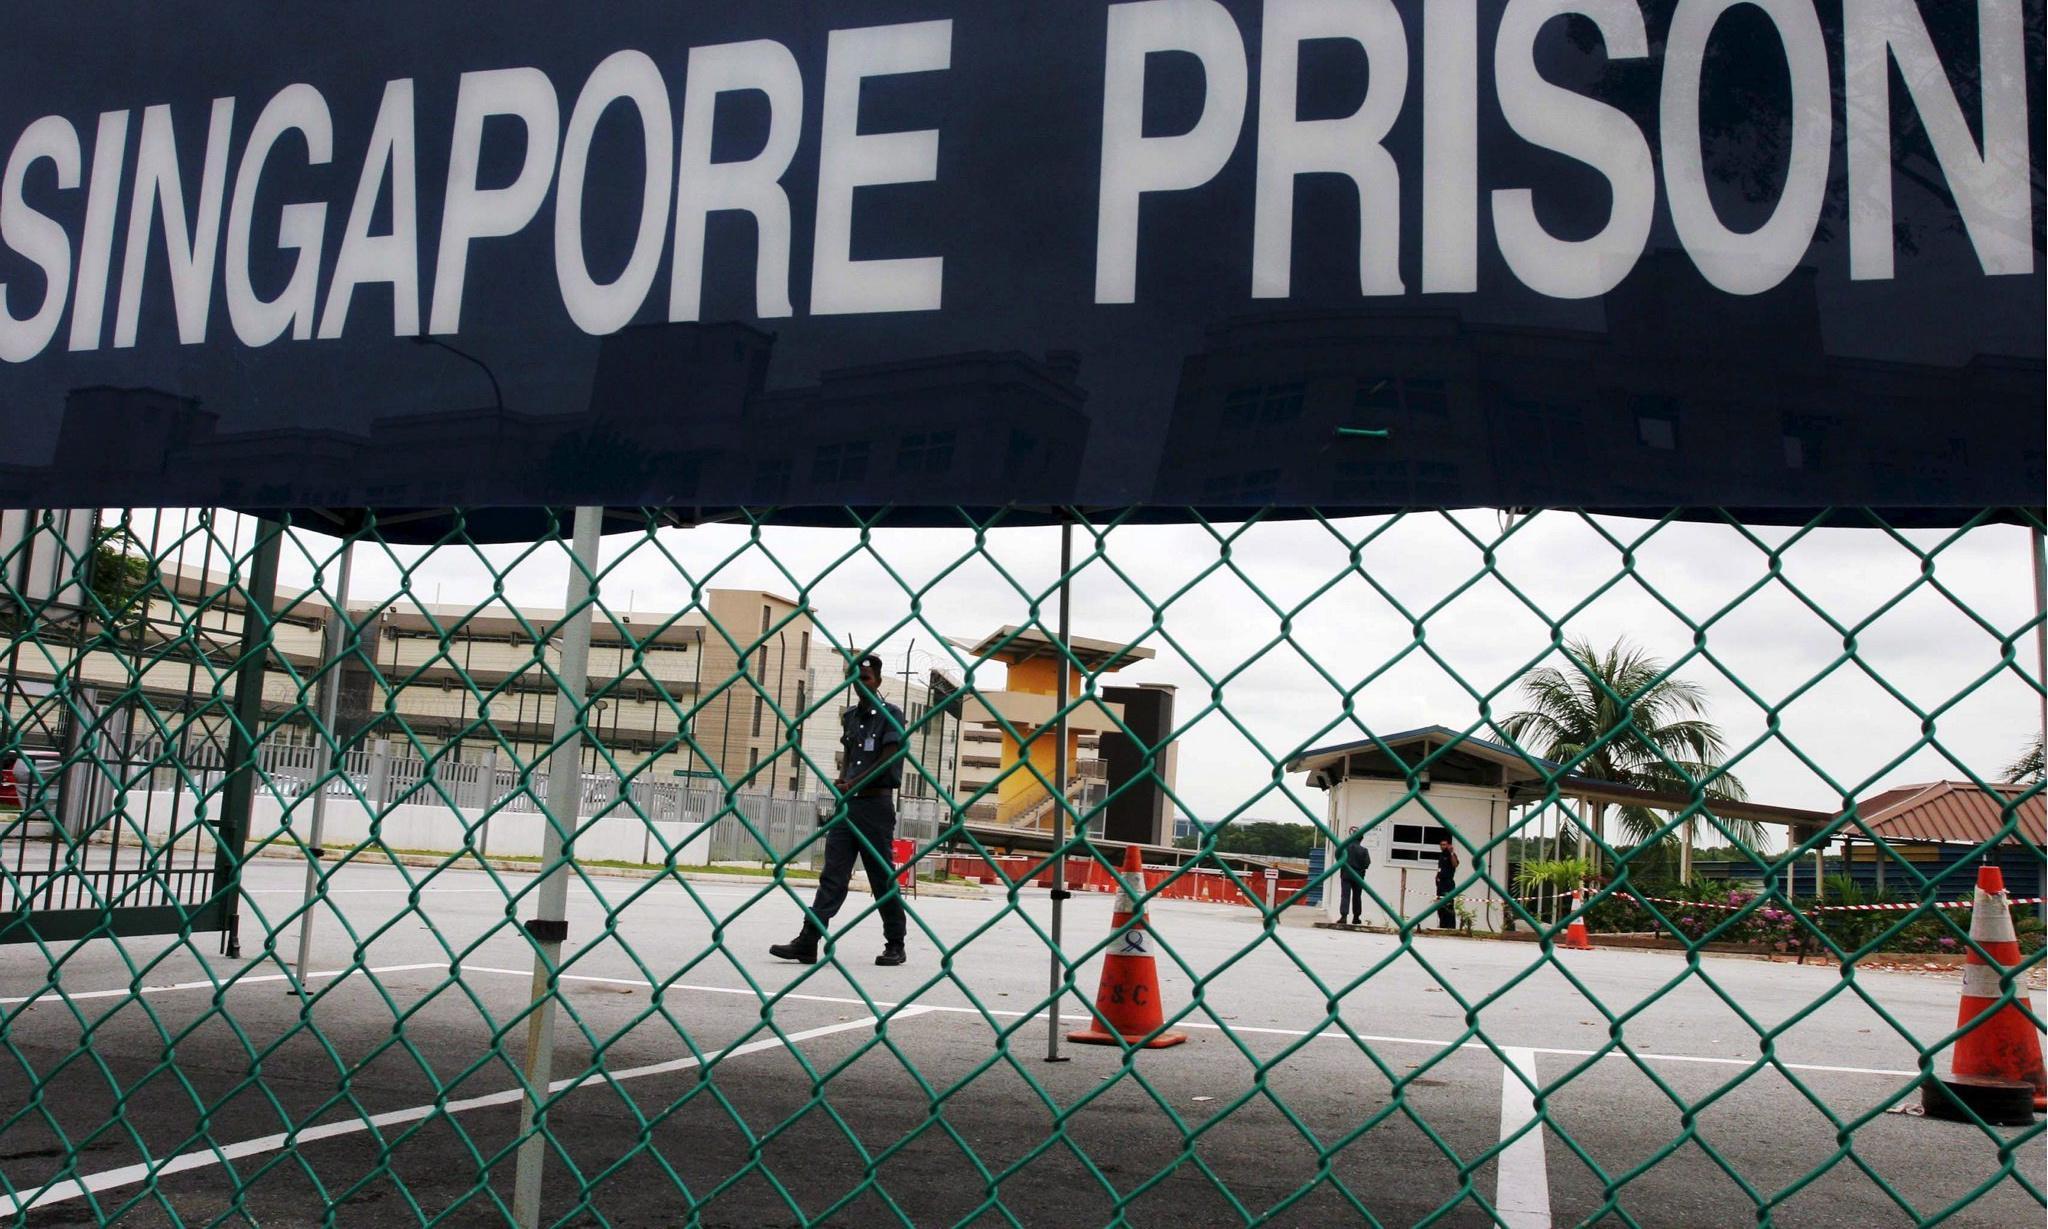 A London DJ's punishment sheds light on Singapore's caning shame